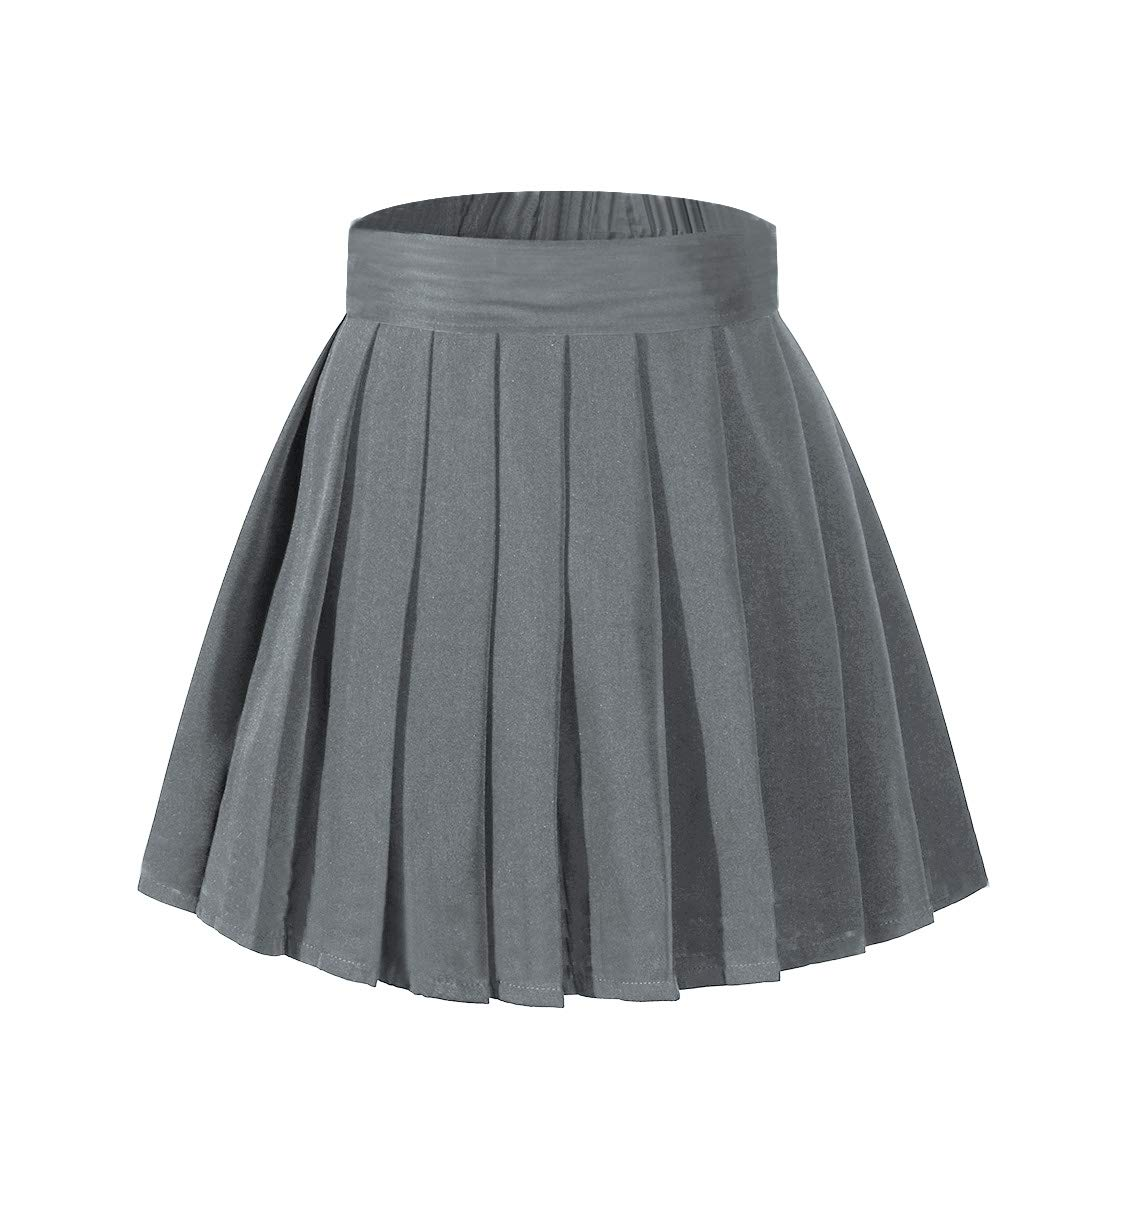 Beautifulfashionlife Girl's High Waist Pleated Mini Skirt Tennis A-line Elastic Shorts Dark Grey,S